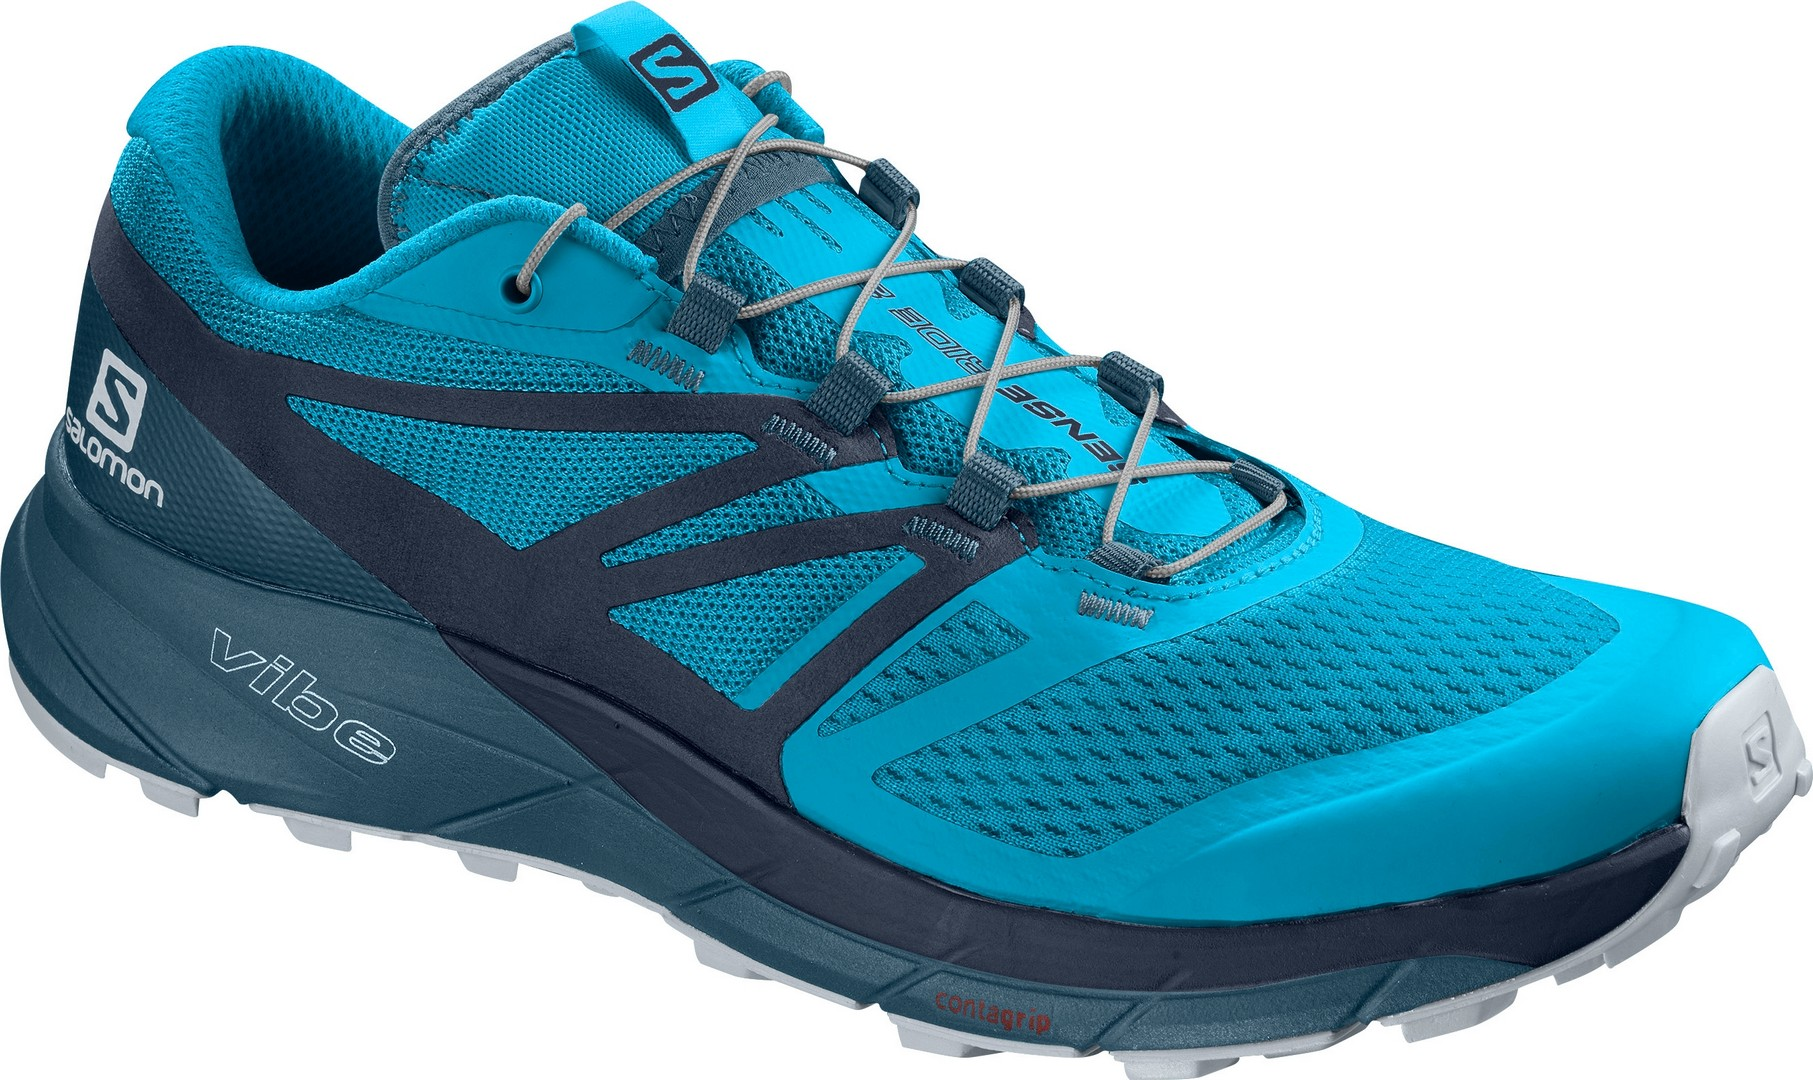 Salomon SENSE RIDE 2, muške patike za trčanje, plava